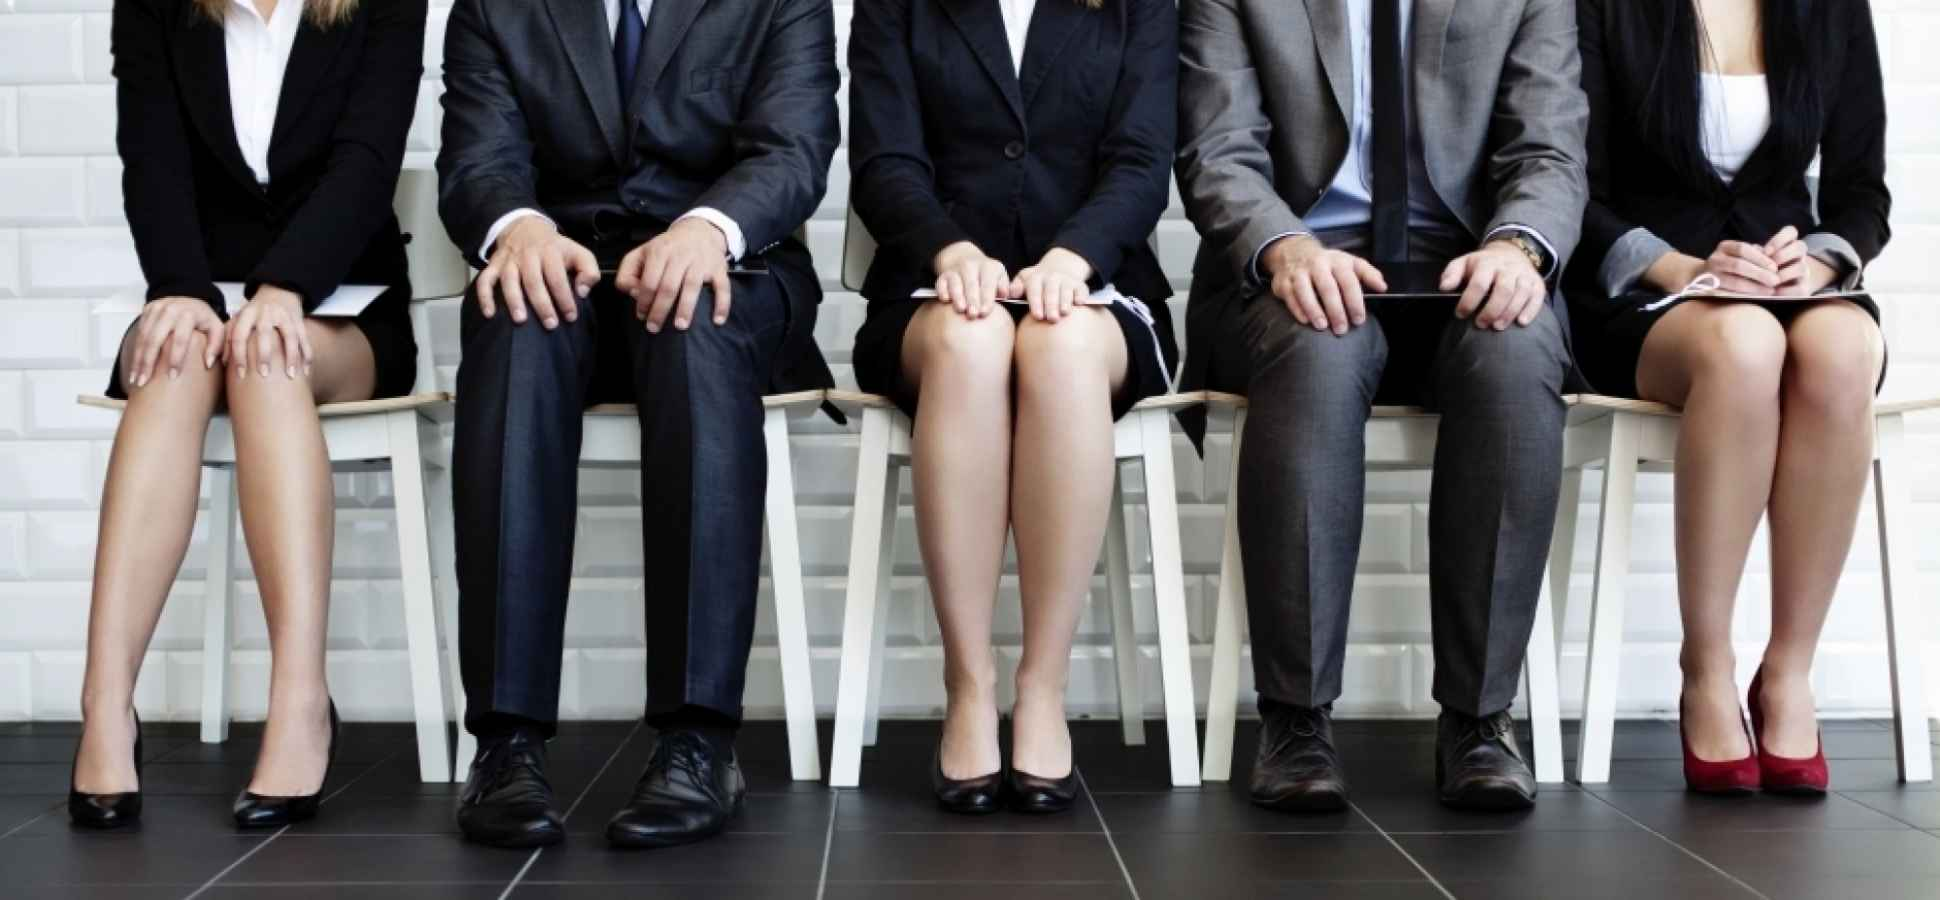 7 employee qualities you must prioritize when hiring inc com